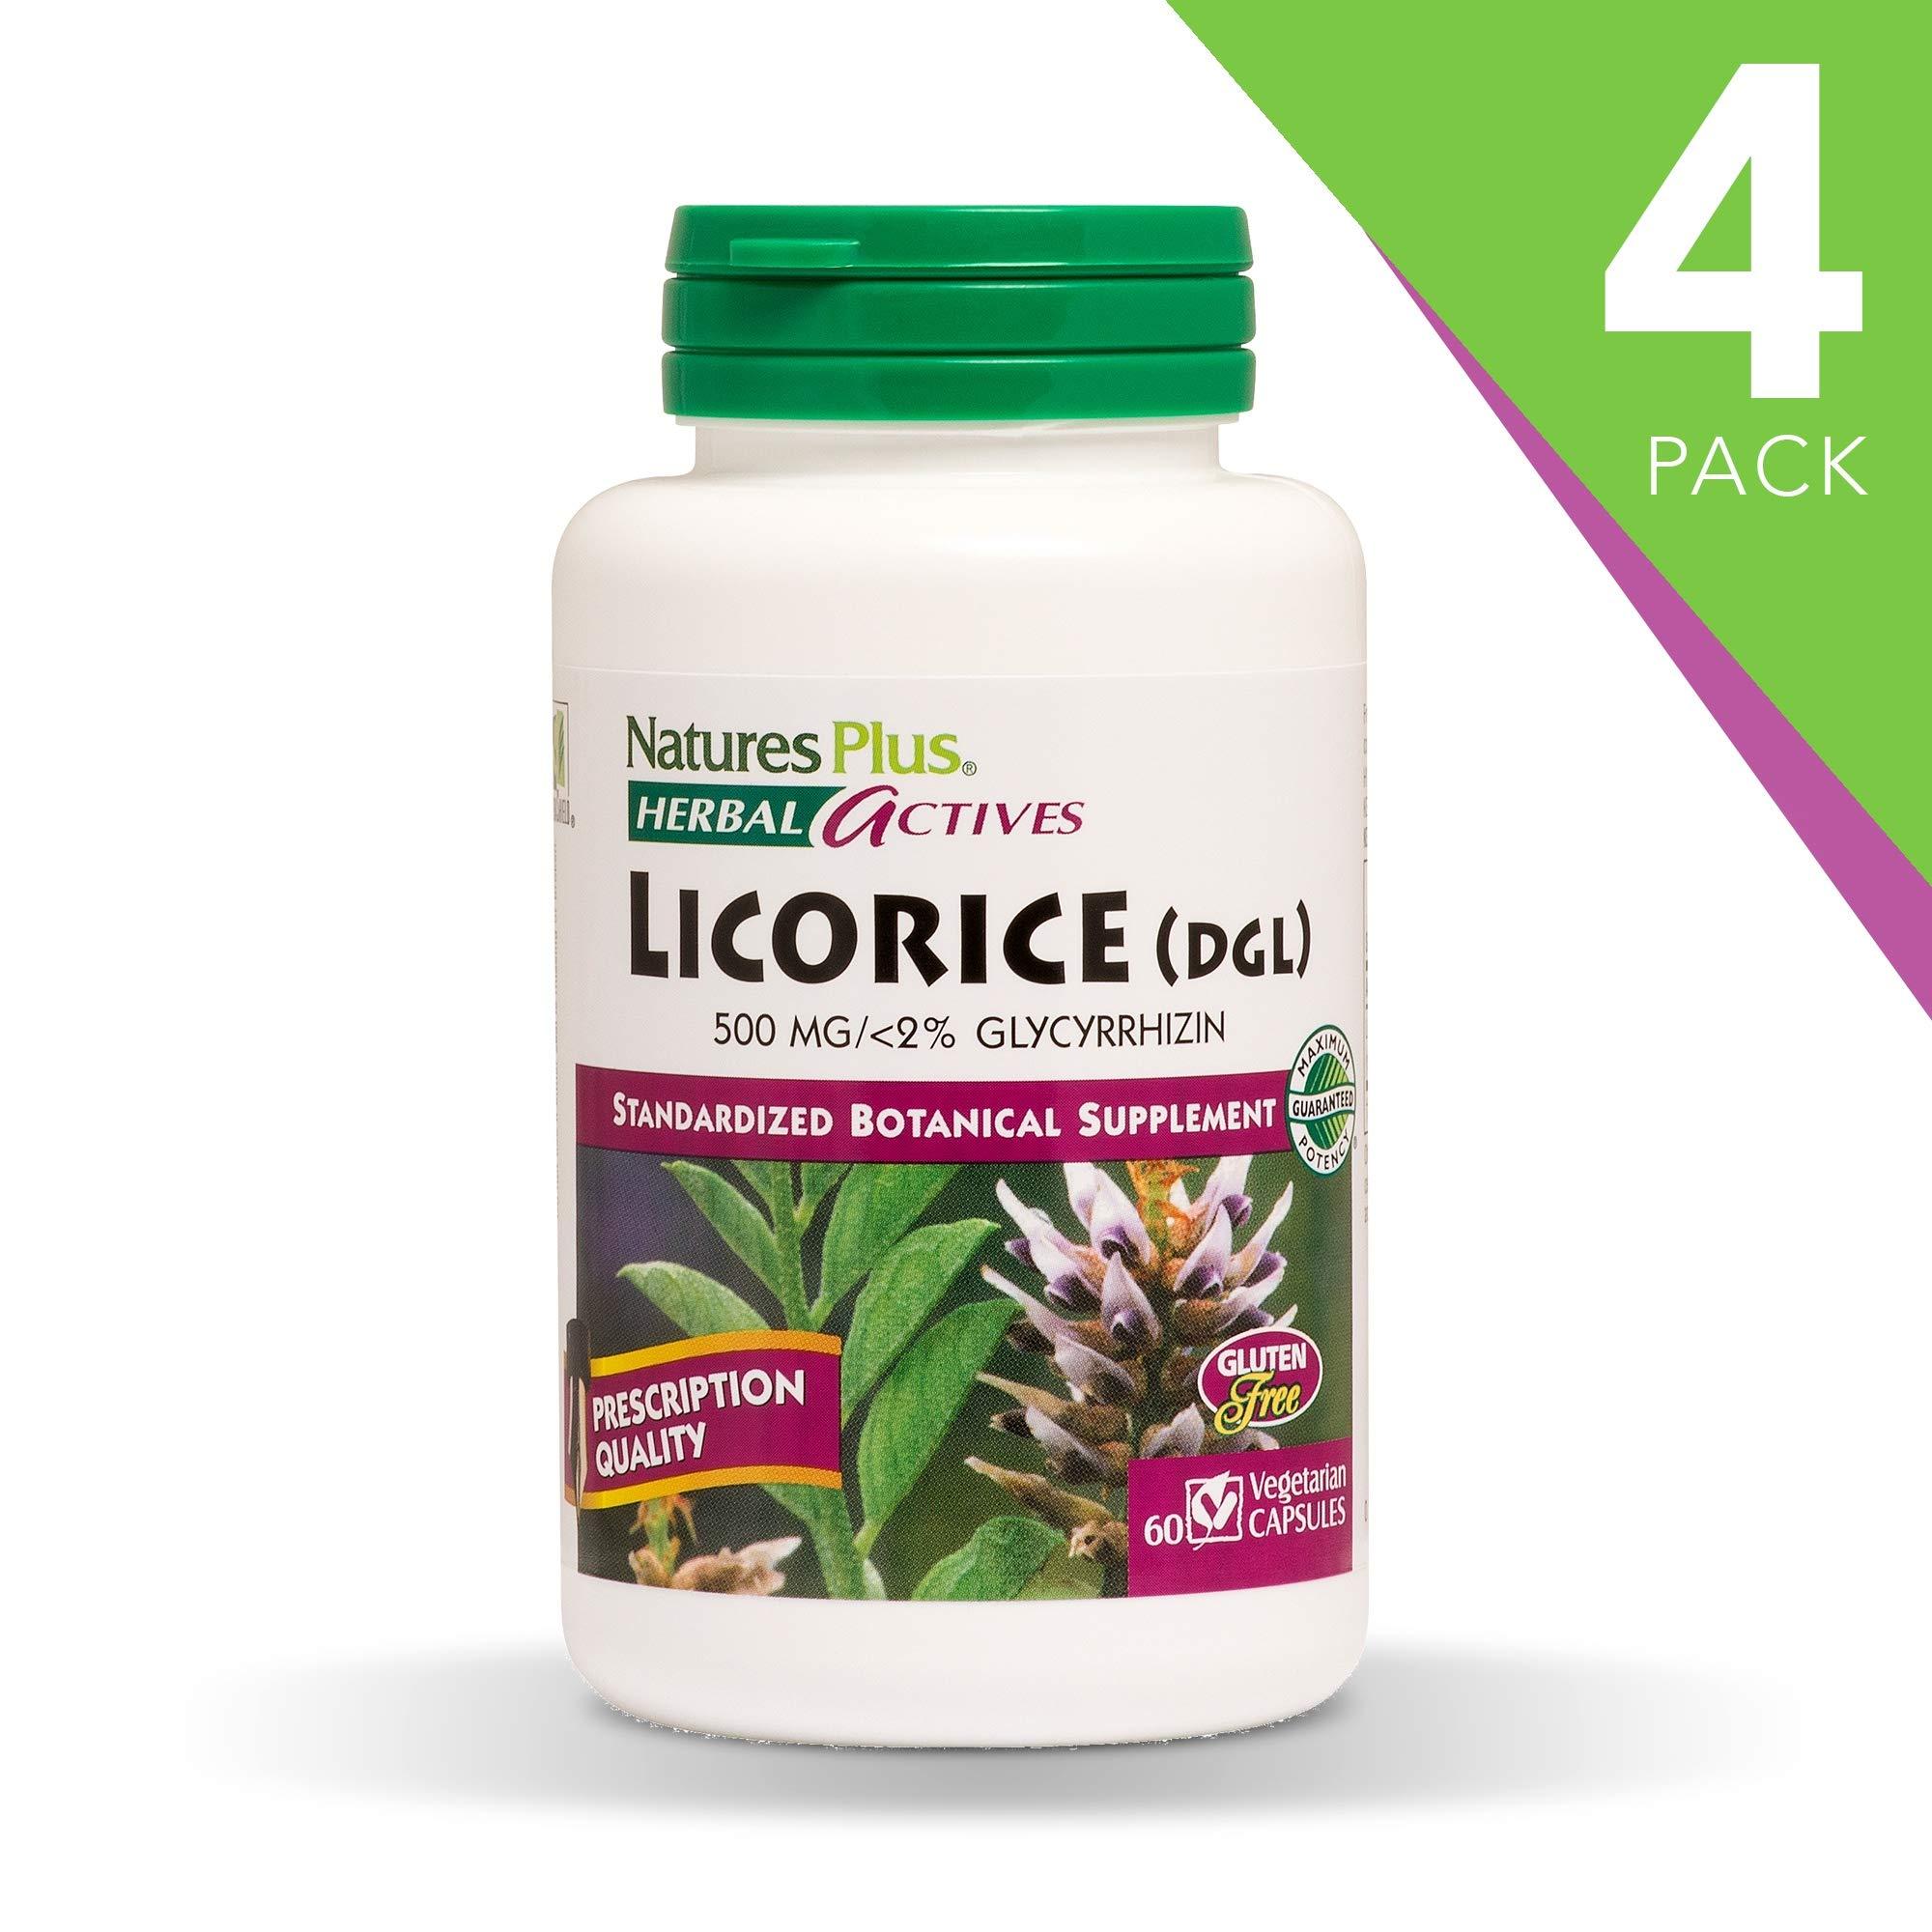 NaturesPlus Herbal Actives Licorice (DGL) Capsules (4 Pack) - 500 mg, 60 Vegan Capsules - Maximum Potency, Anti-Inflammatory, Stomach Reliever - Vegetarian, Gluten-Free - 60 Servings